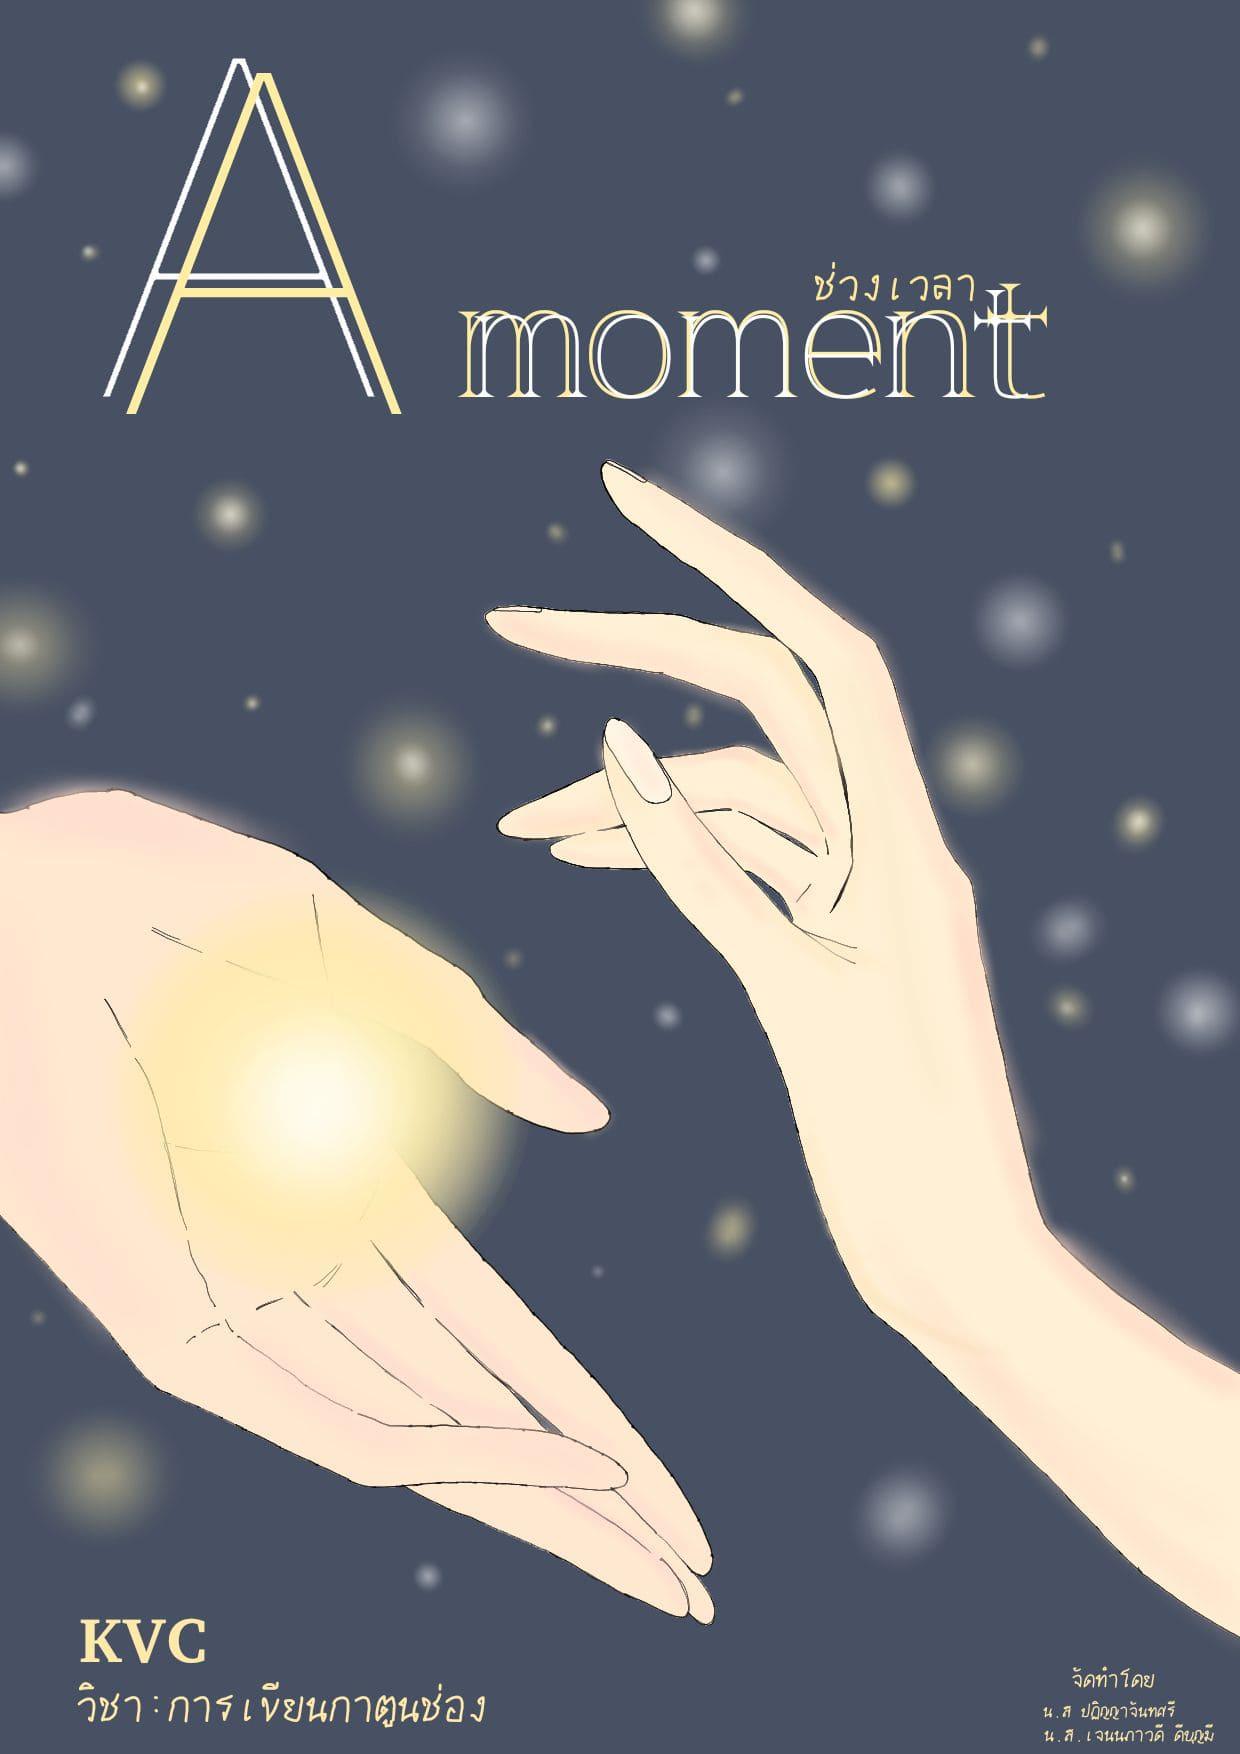 A moment (ช่วงเวลา)